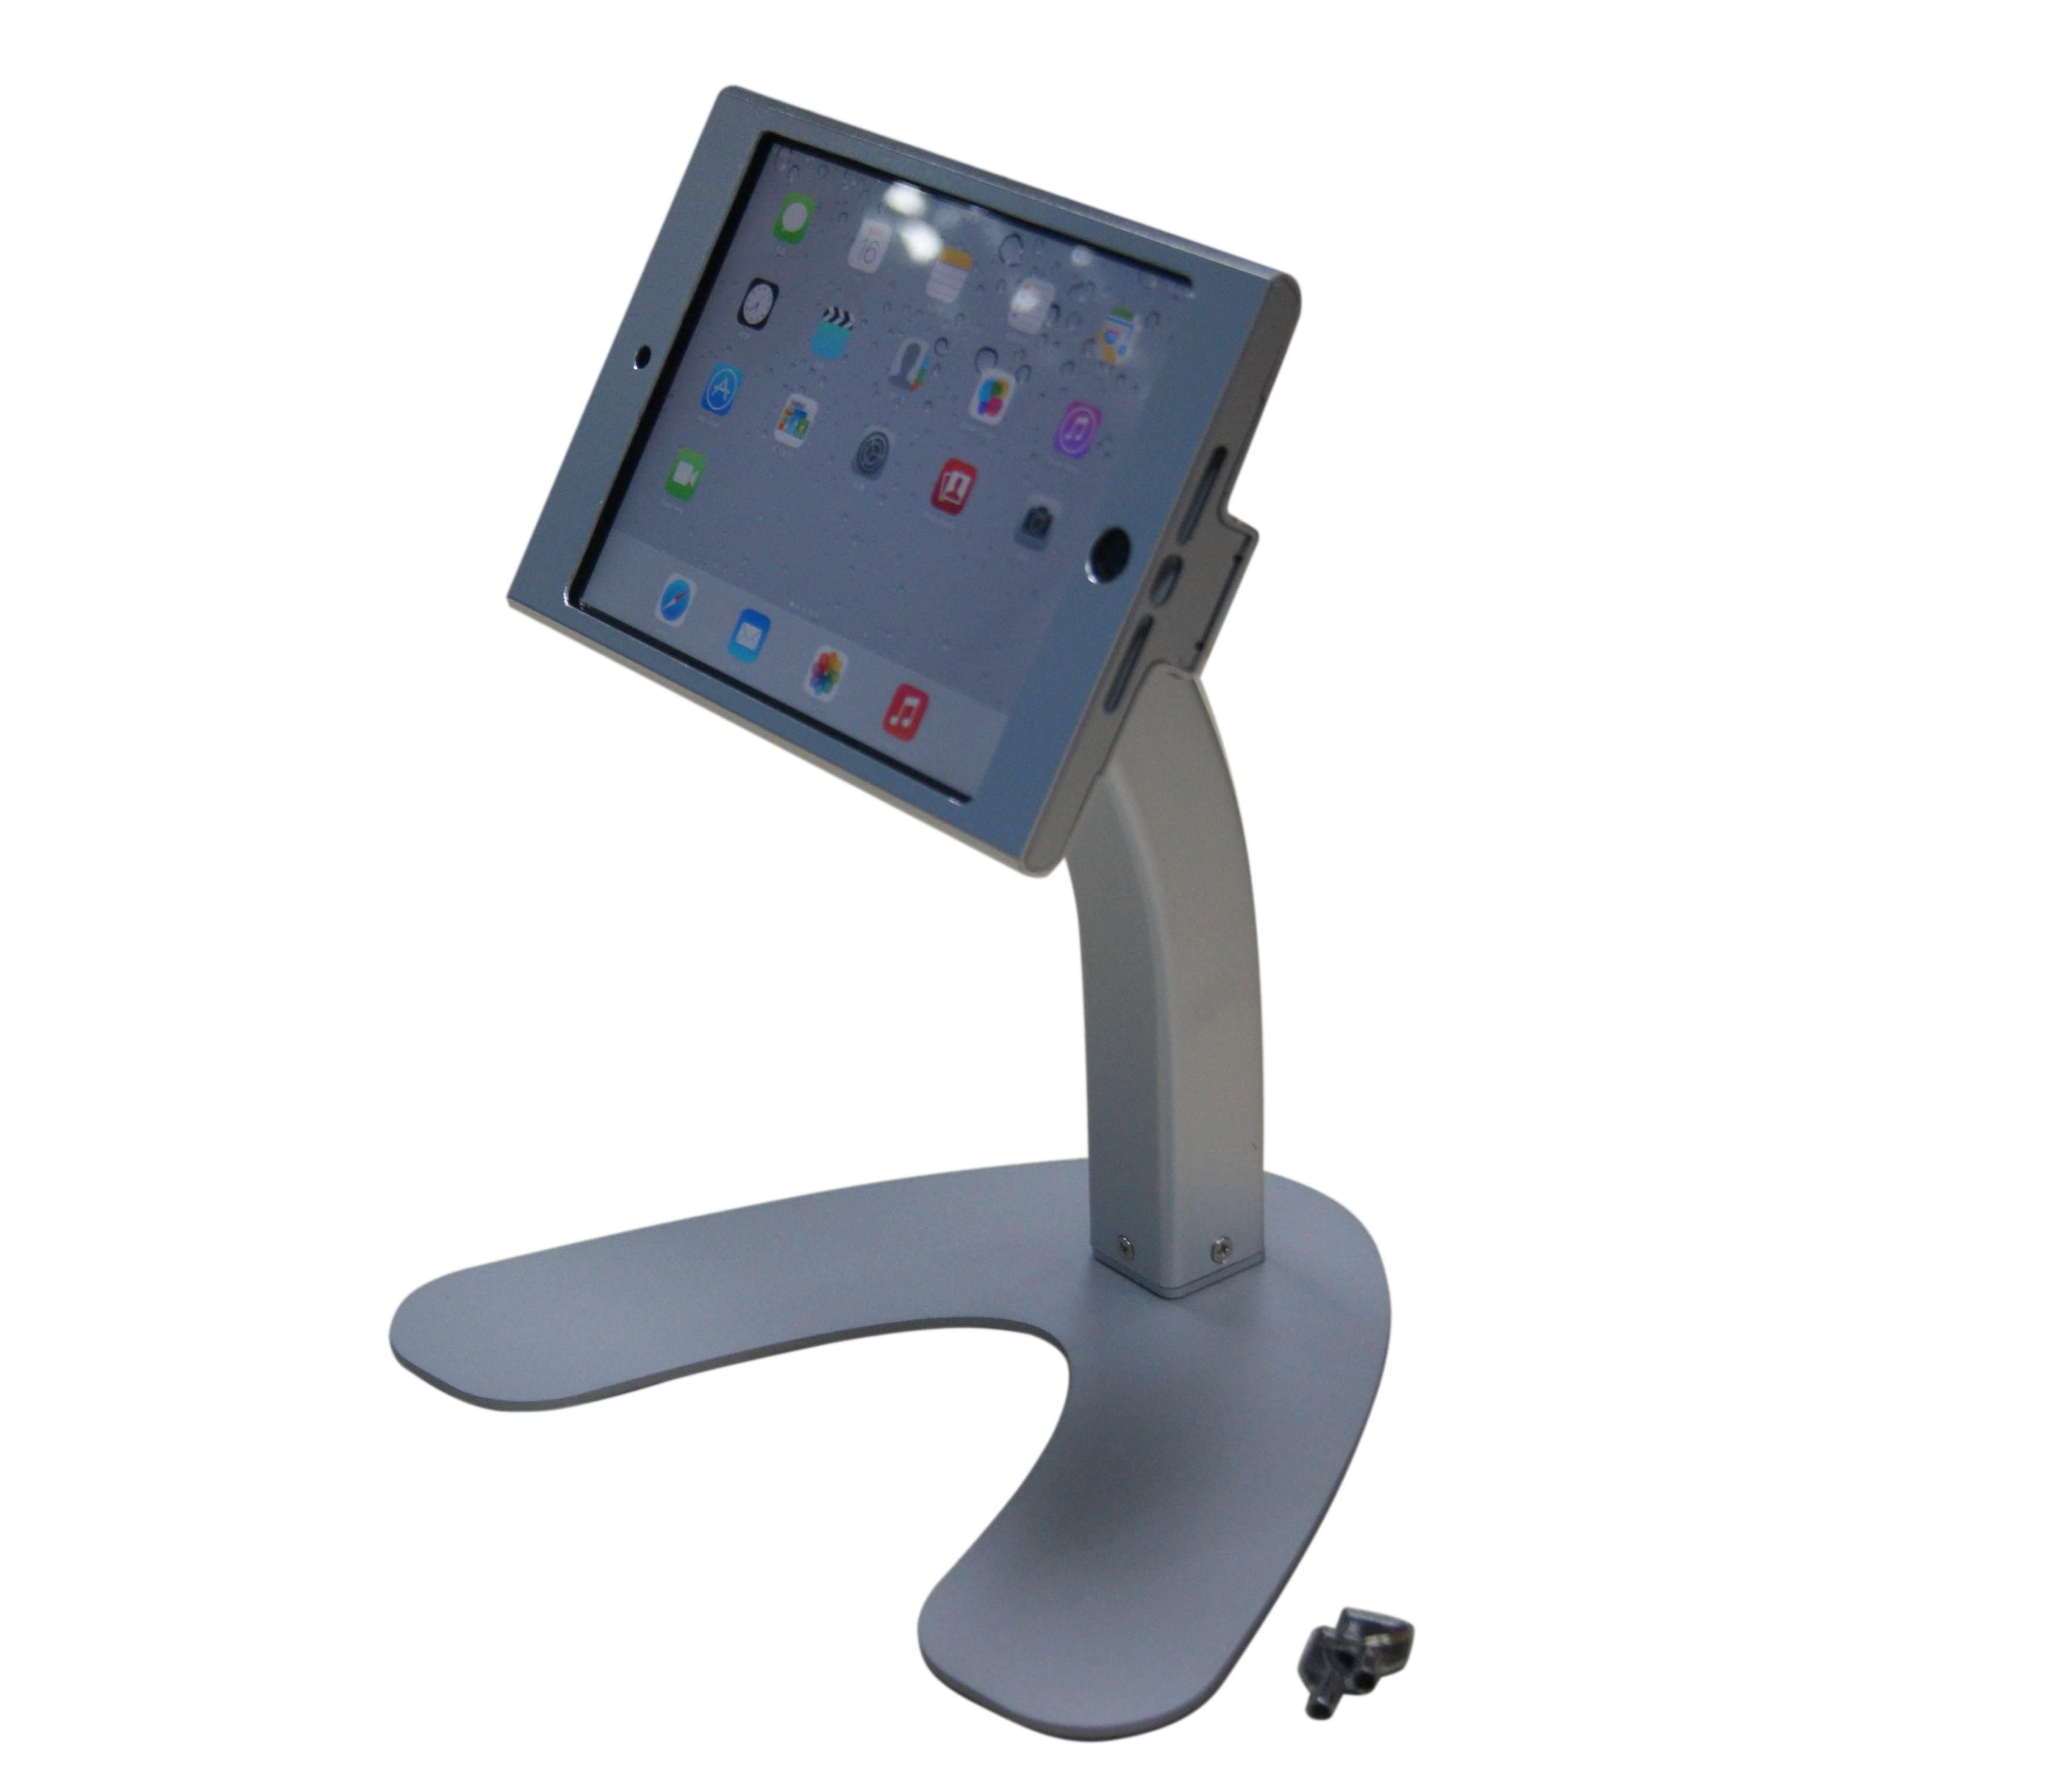 P9m Ipad Mini Desktop Stand With Lock Tv Wall Mount